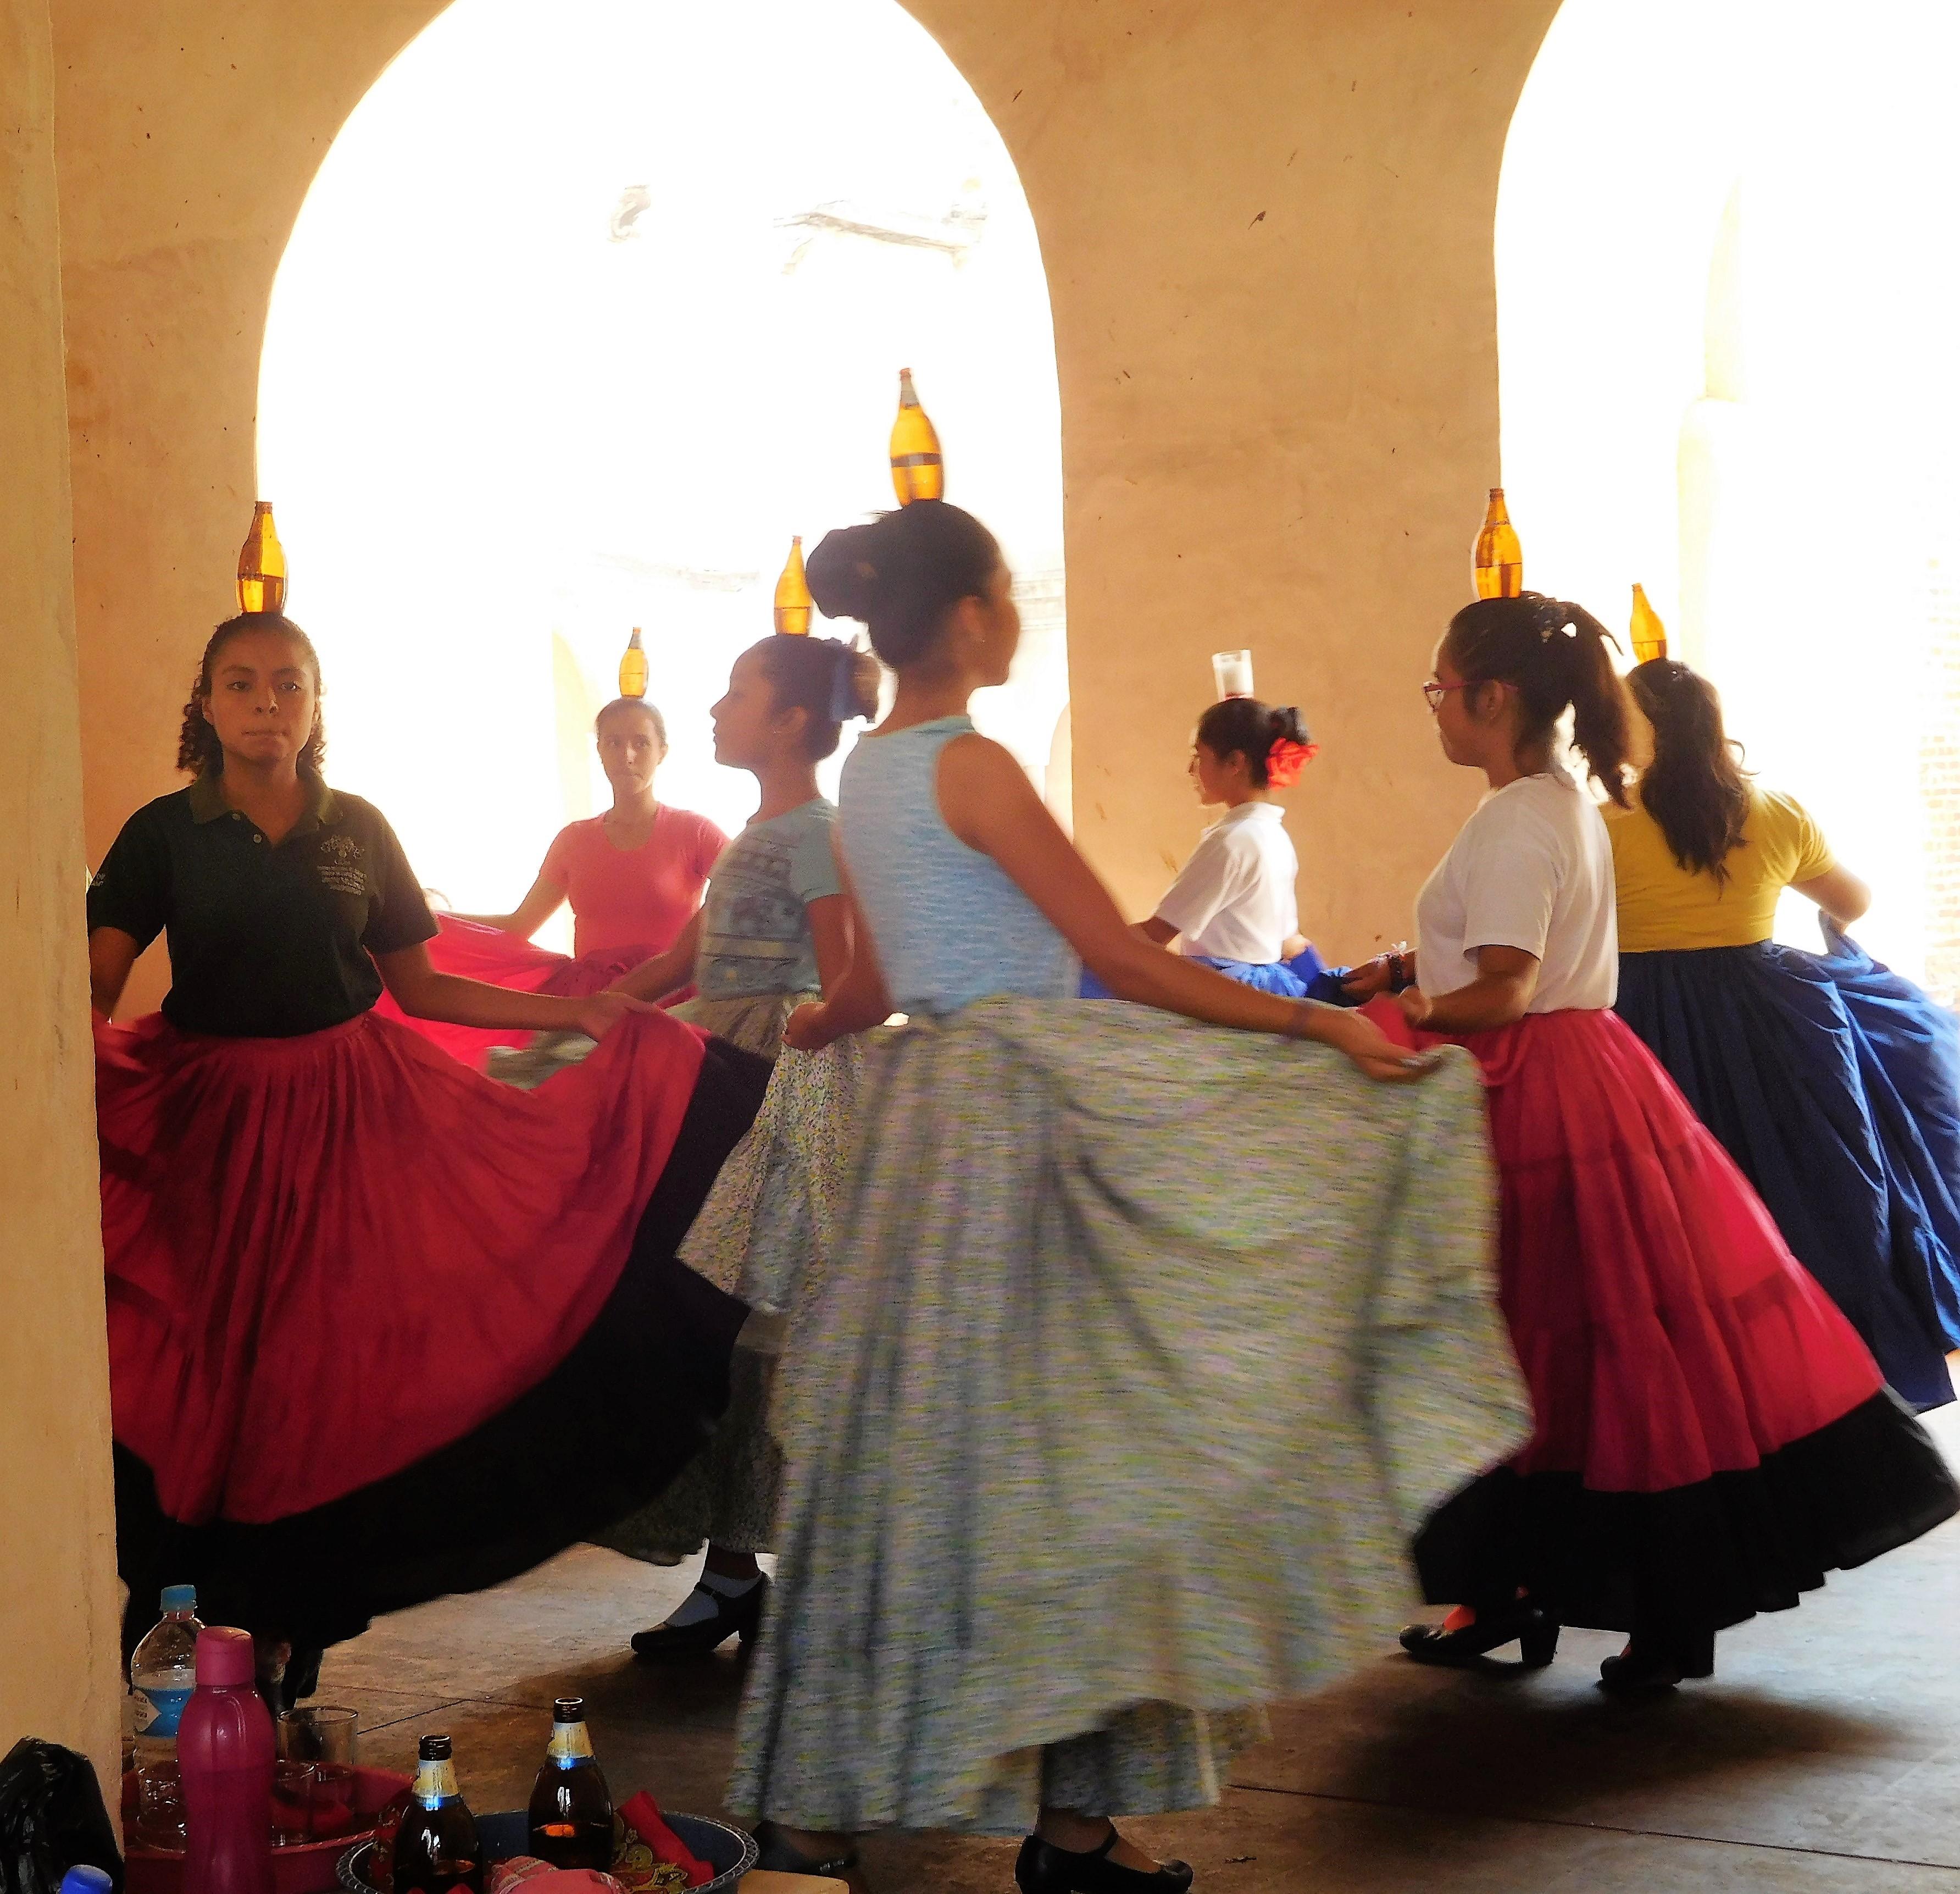 2017 Mundo Maya de Tuxtla Butierrez, Mexico Outbound Journey in April